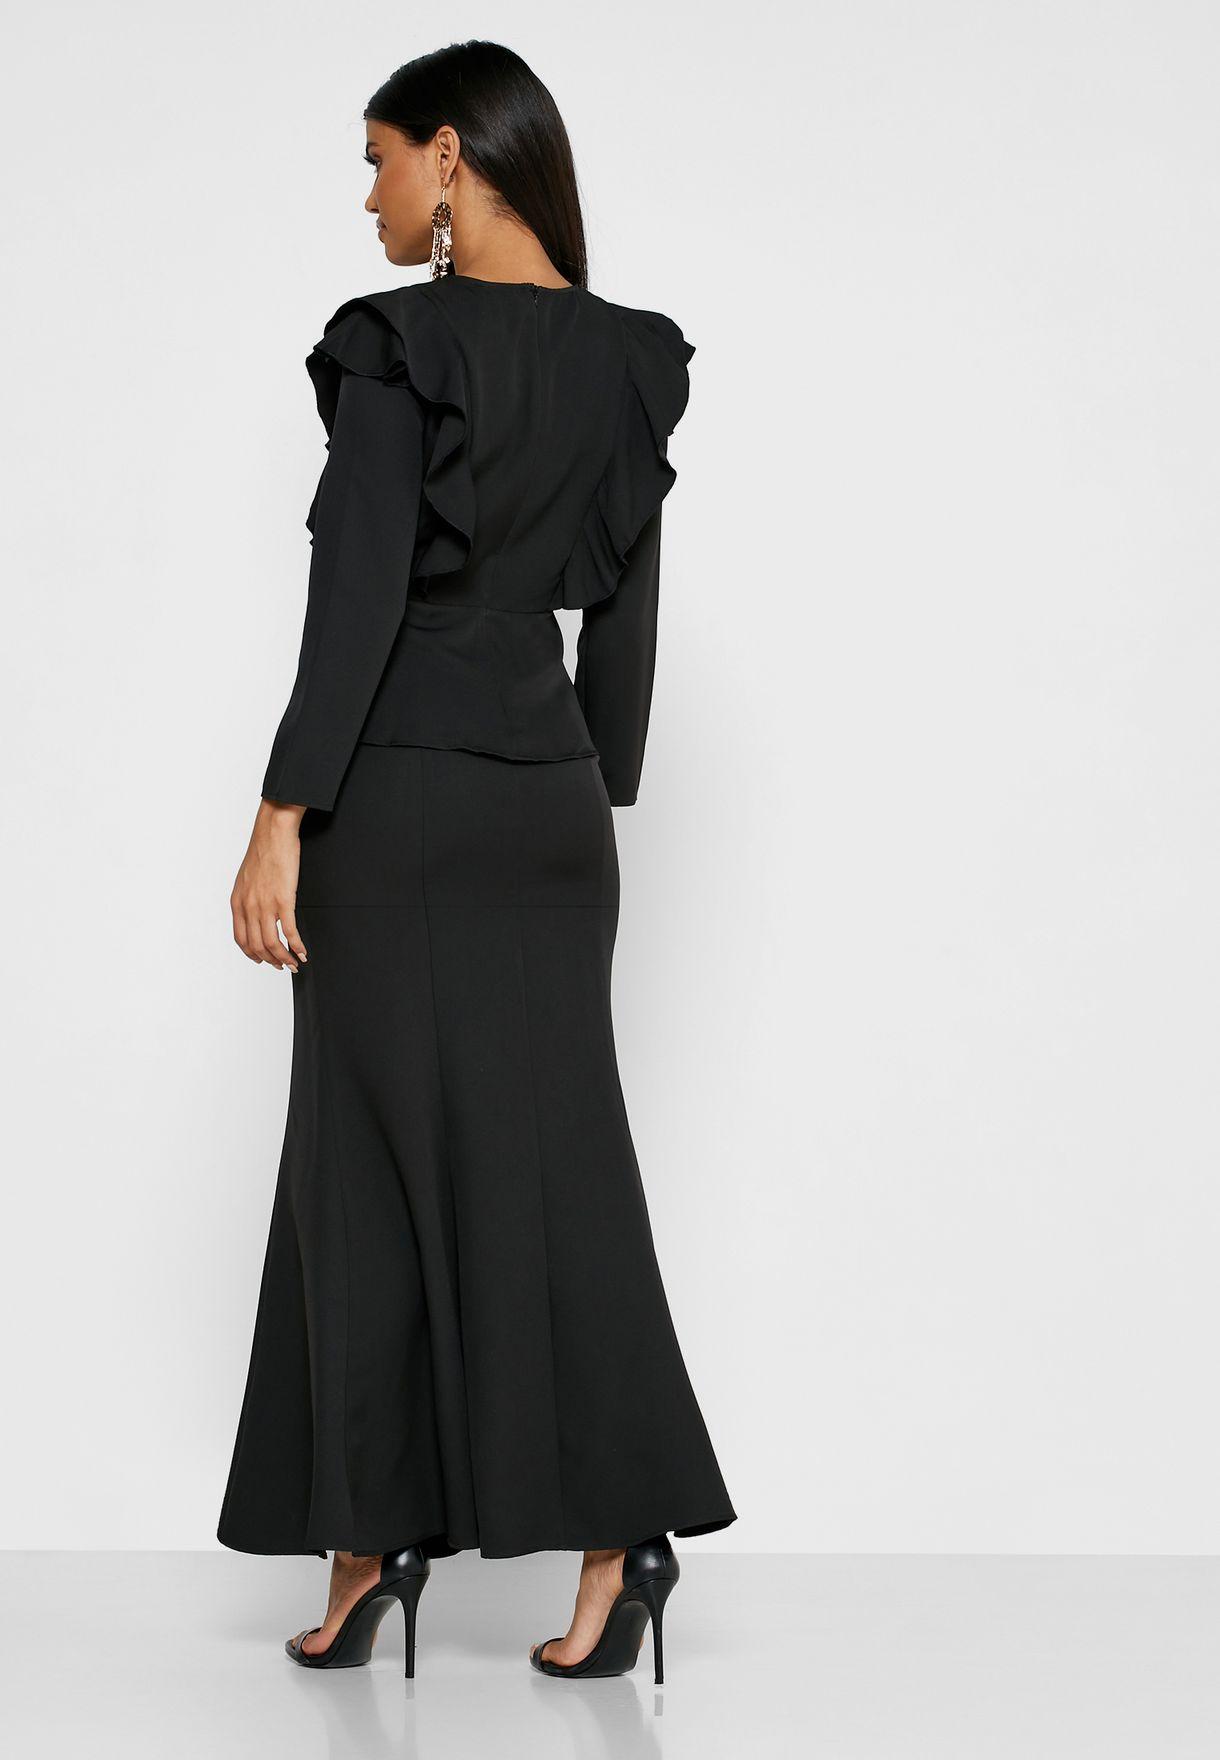 Ruffle Sleeve Maxi Skirt Set